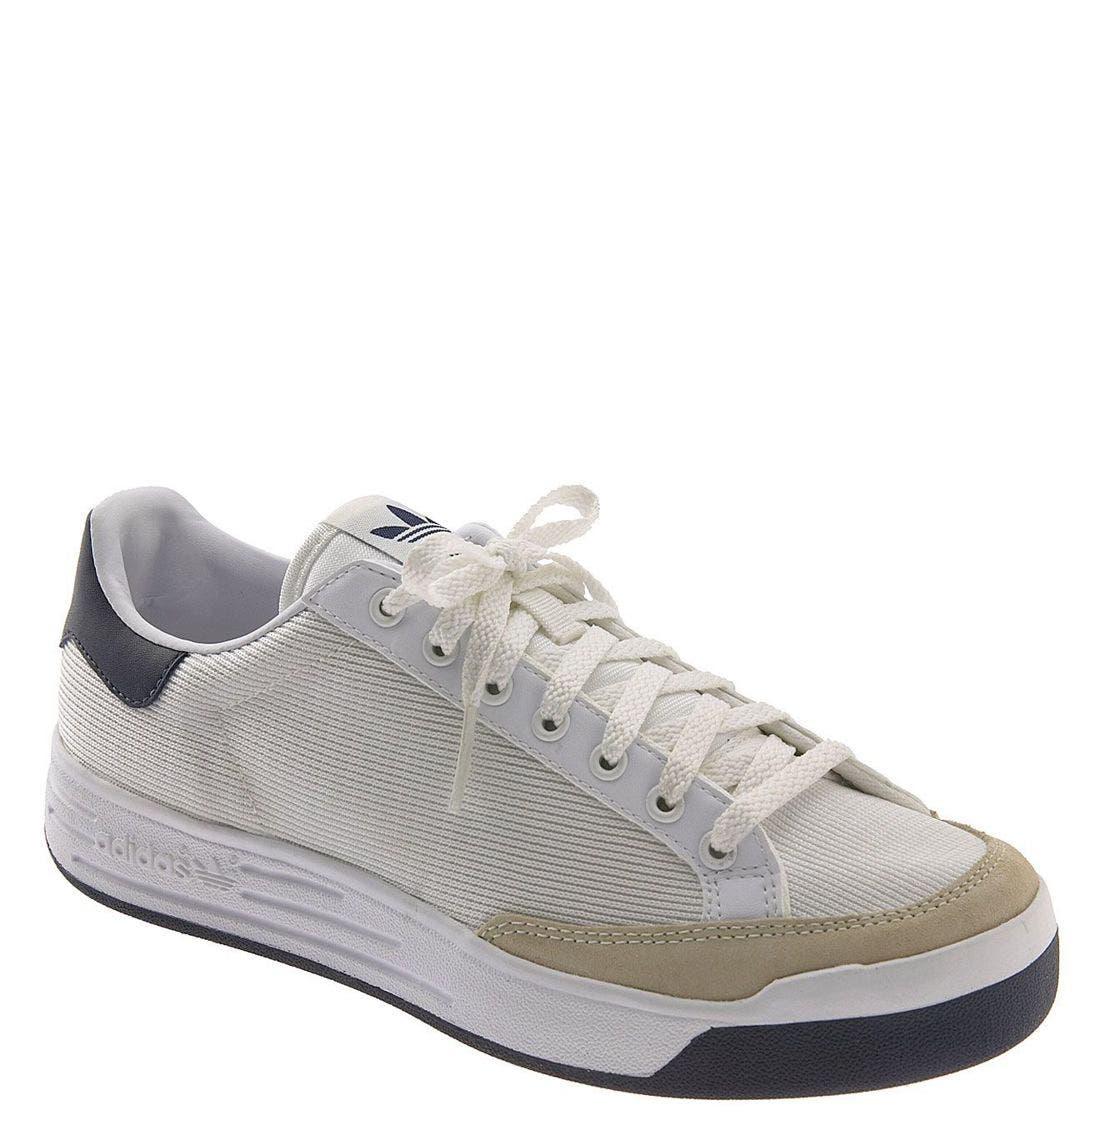 Main Image - adidas 'Rod Laver' Sneaker (Men)